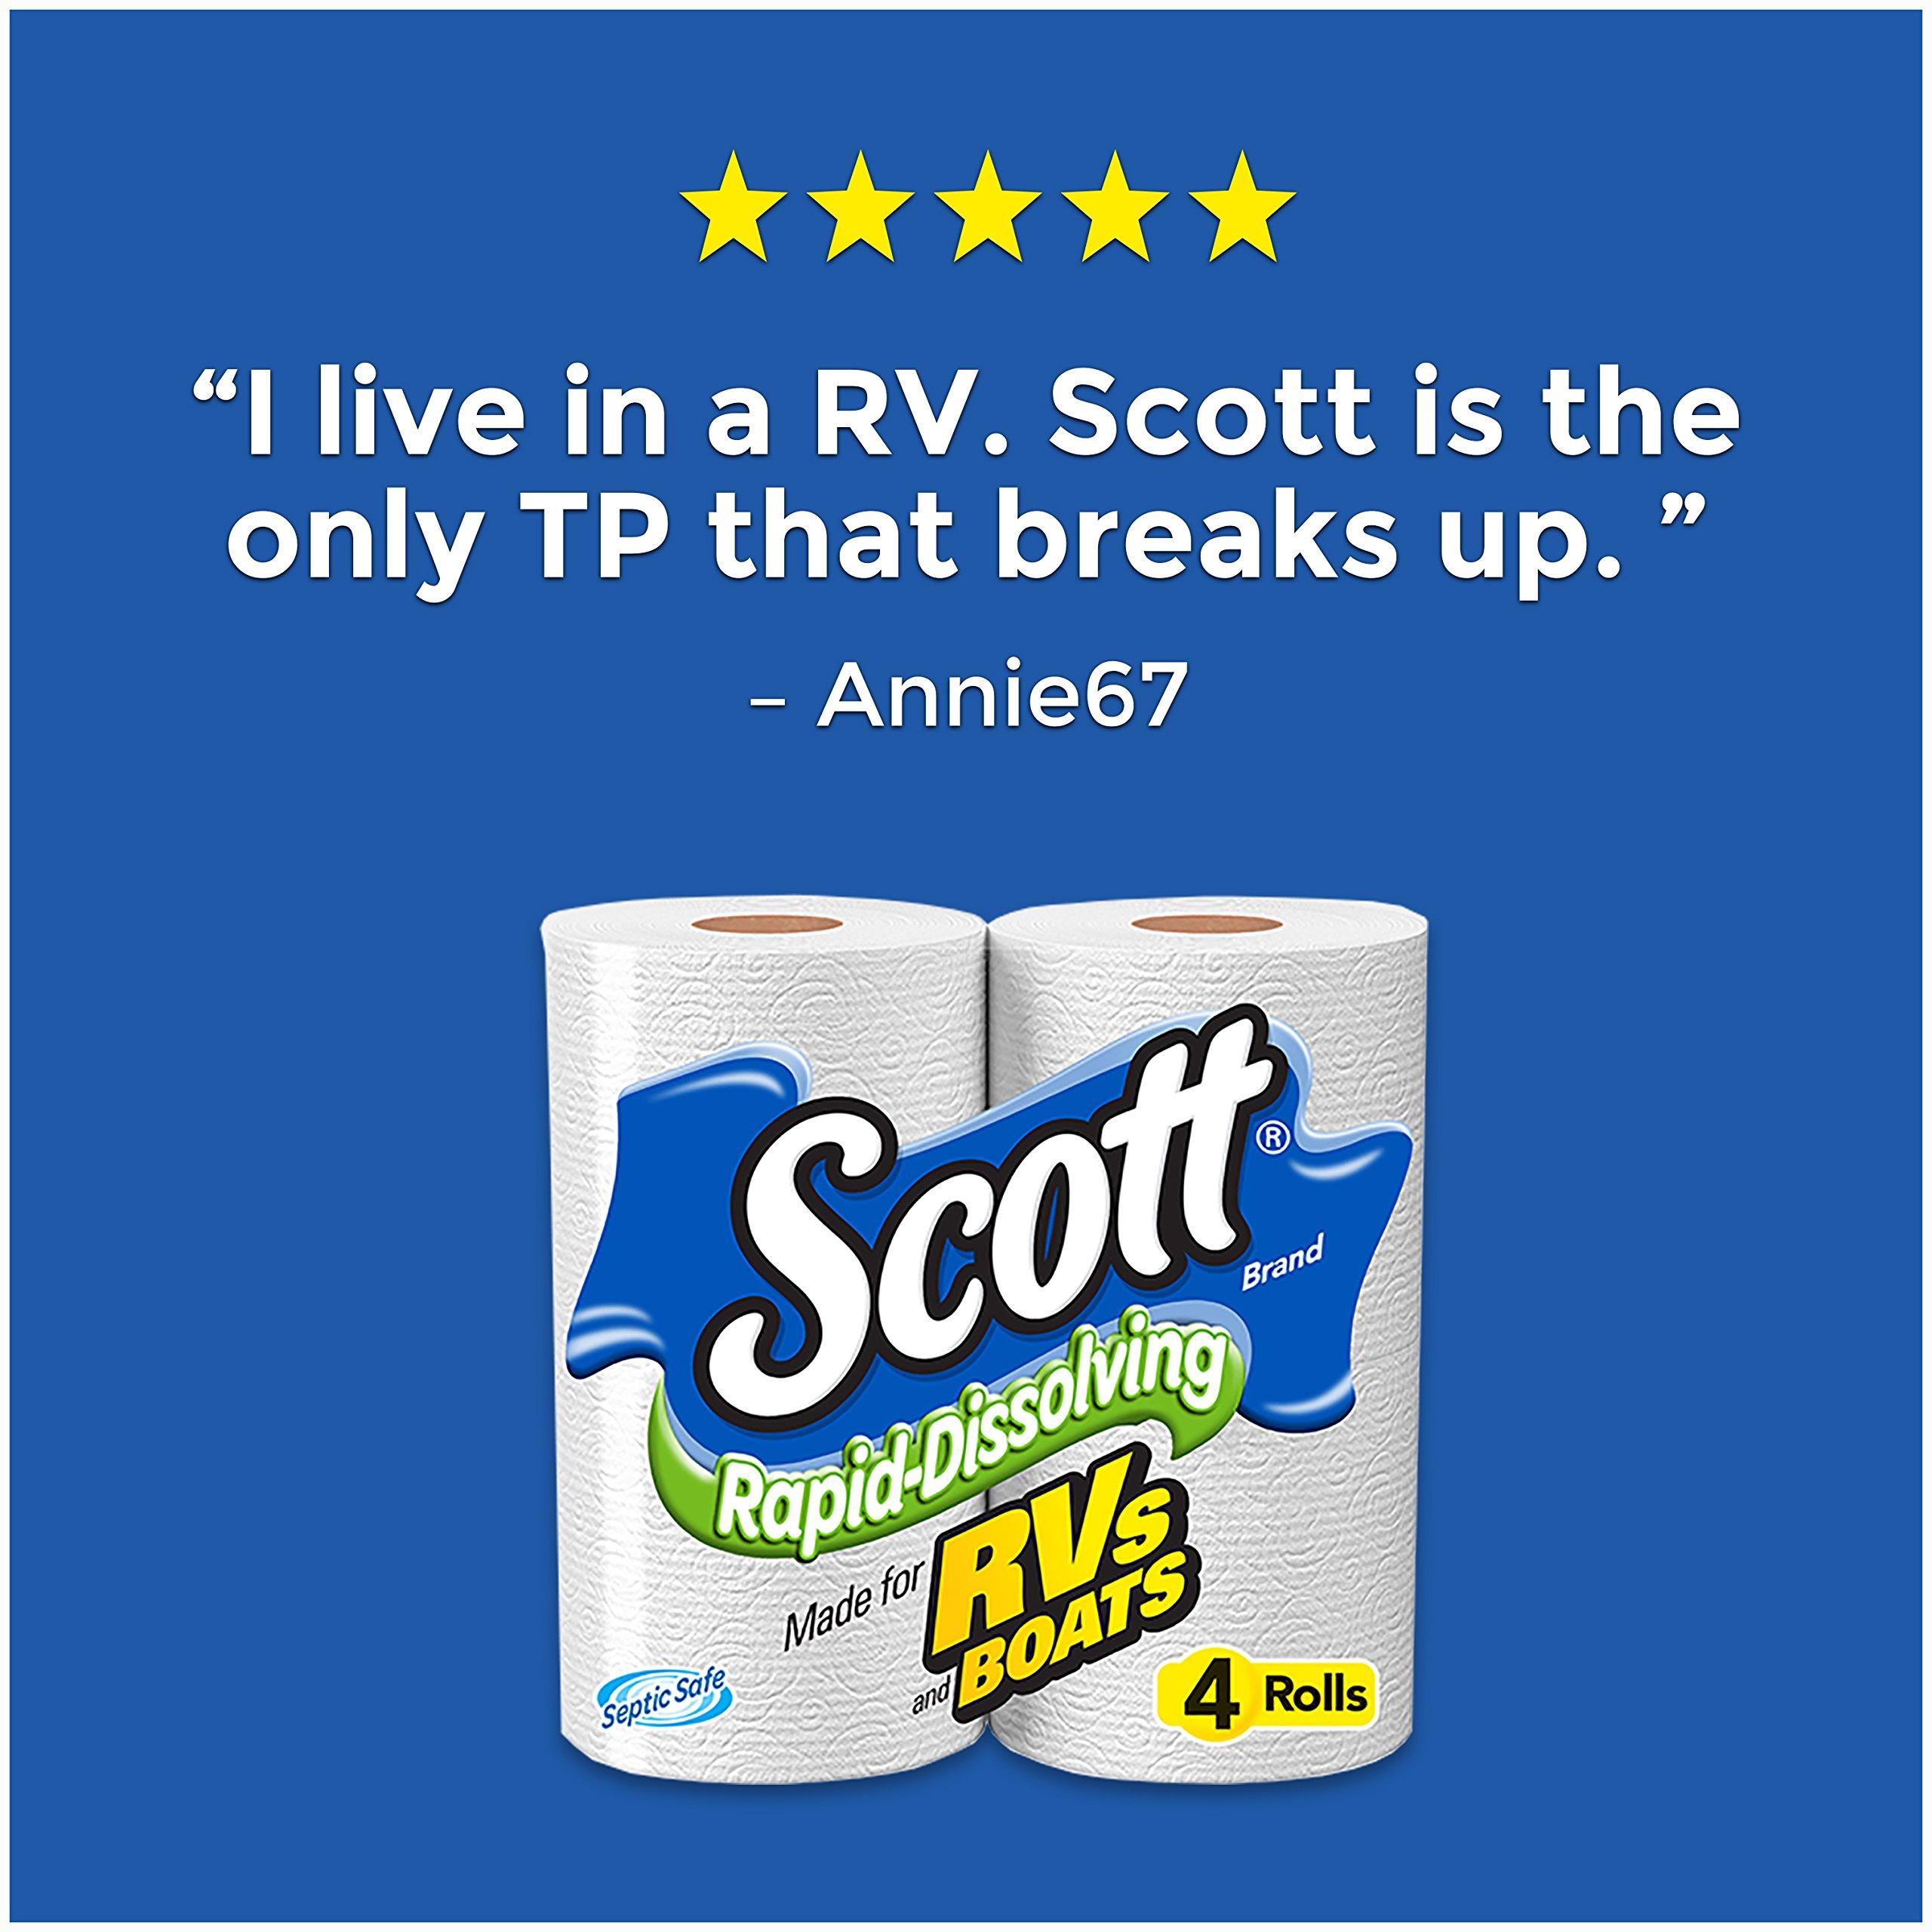 Scott Rapid-Dissolving Toilet Paper, 48 Rolls, Bath Tissue pack of 12 by Scott (Image #4)